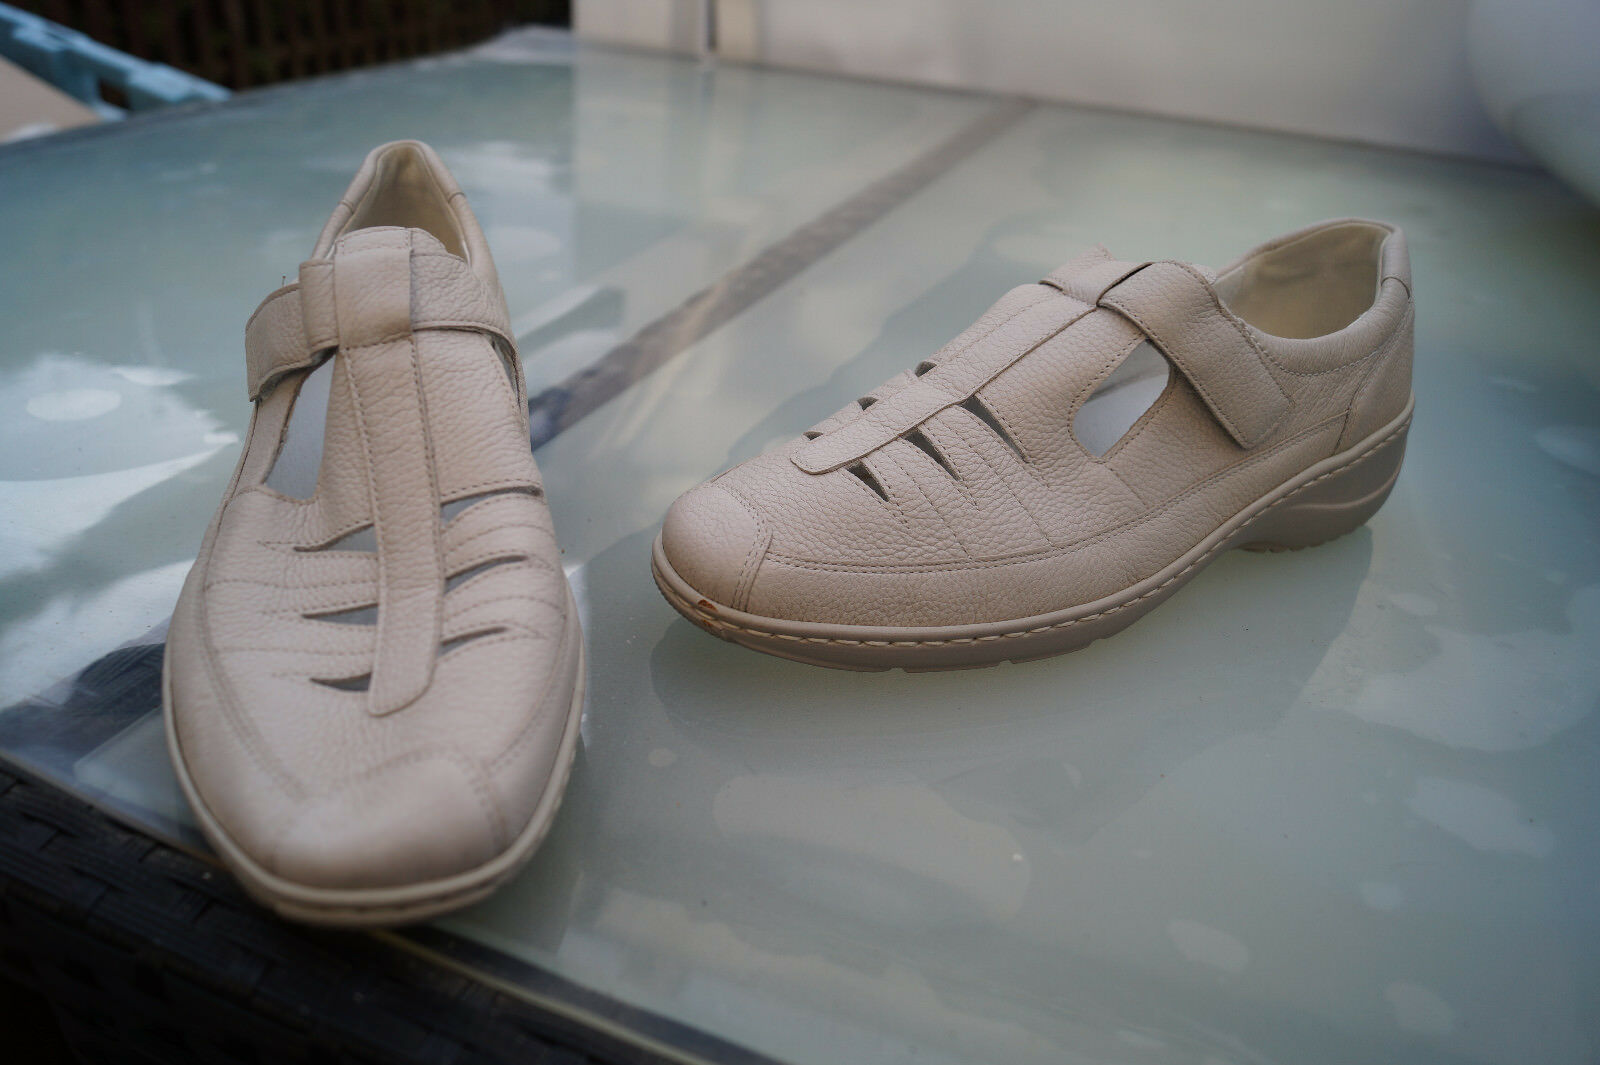 WALDLÄUFER Damen Sommer Schuhe Comfort Sandalen leicht leicht leicht & bequem Gr.7 / 40,5 #2s 4a8fc8